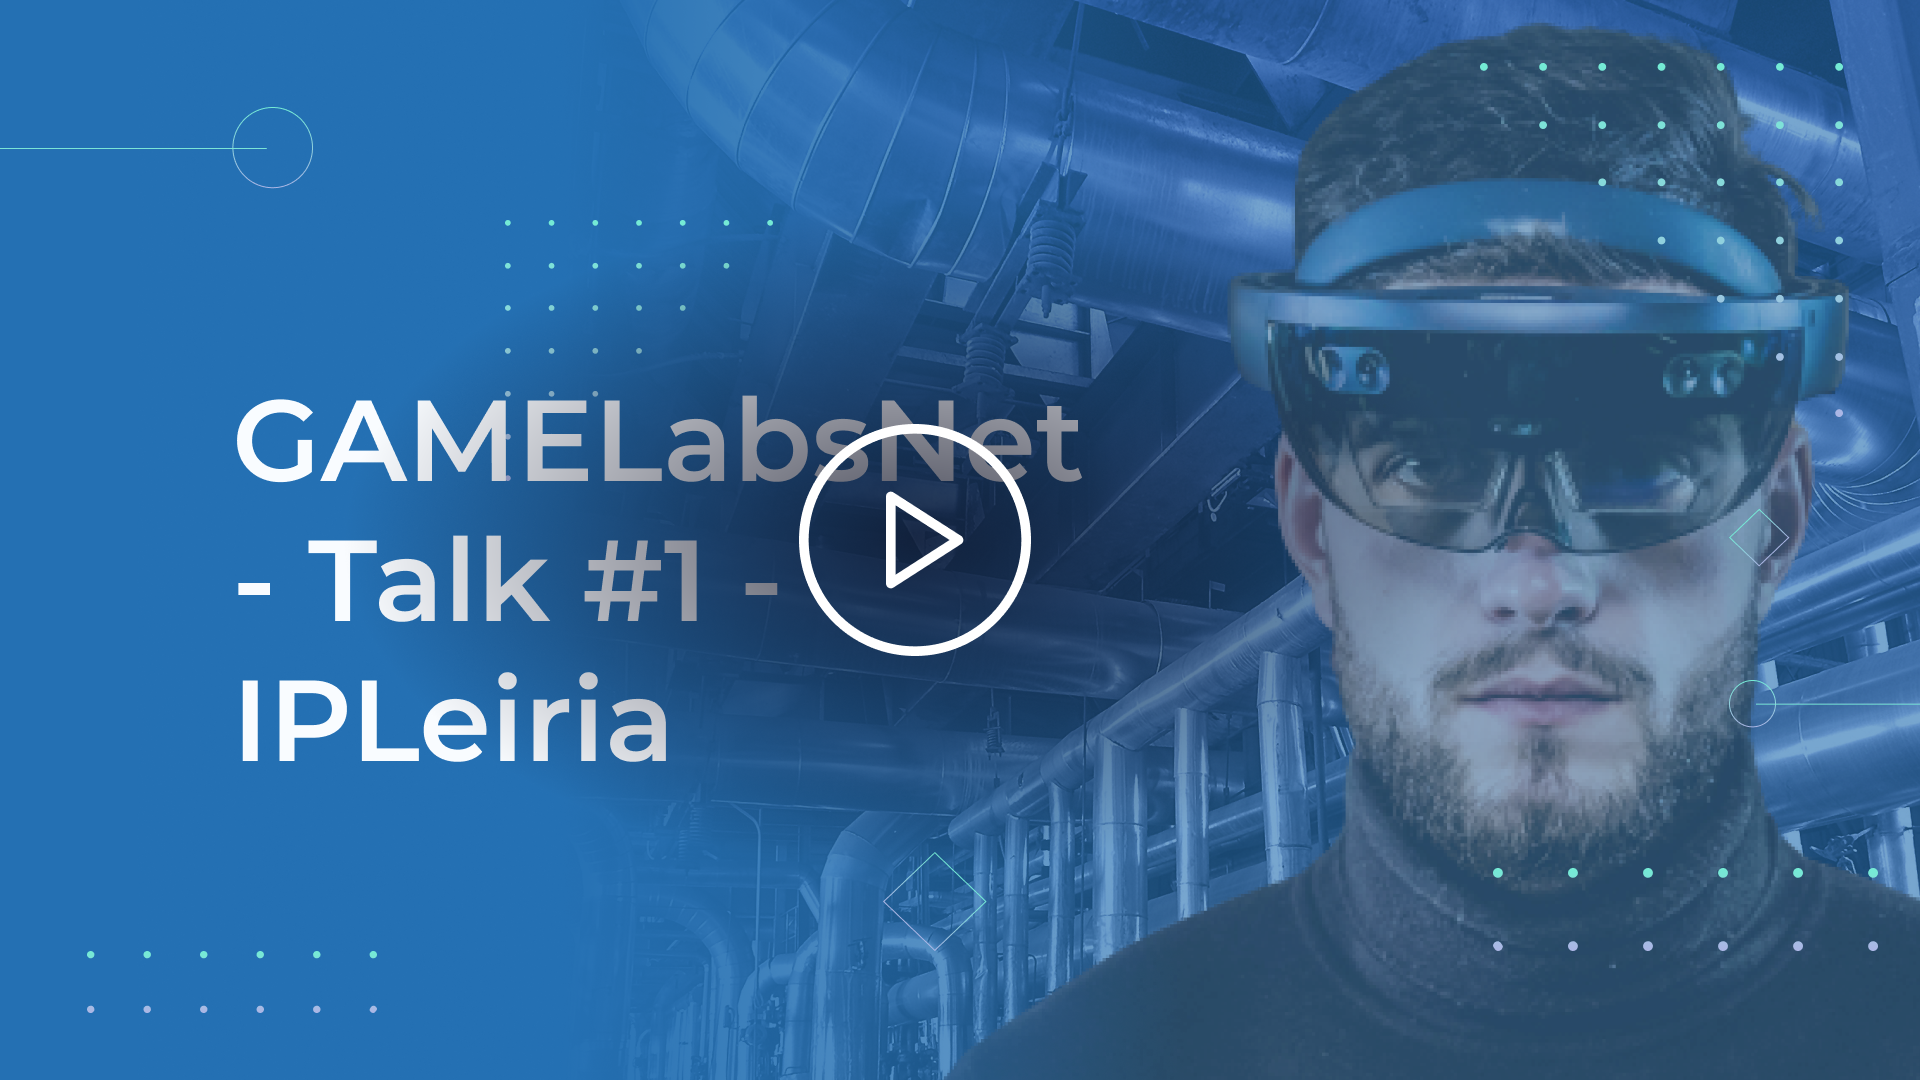 GameLABS Webinar on Augmented Reality